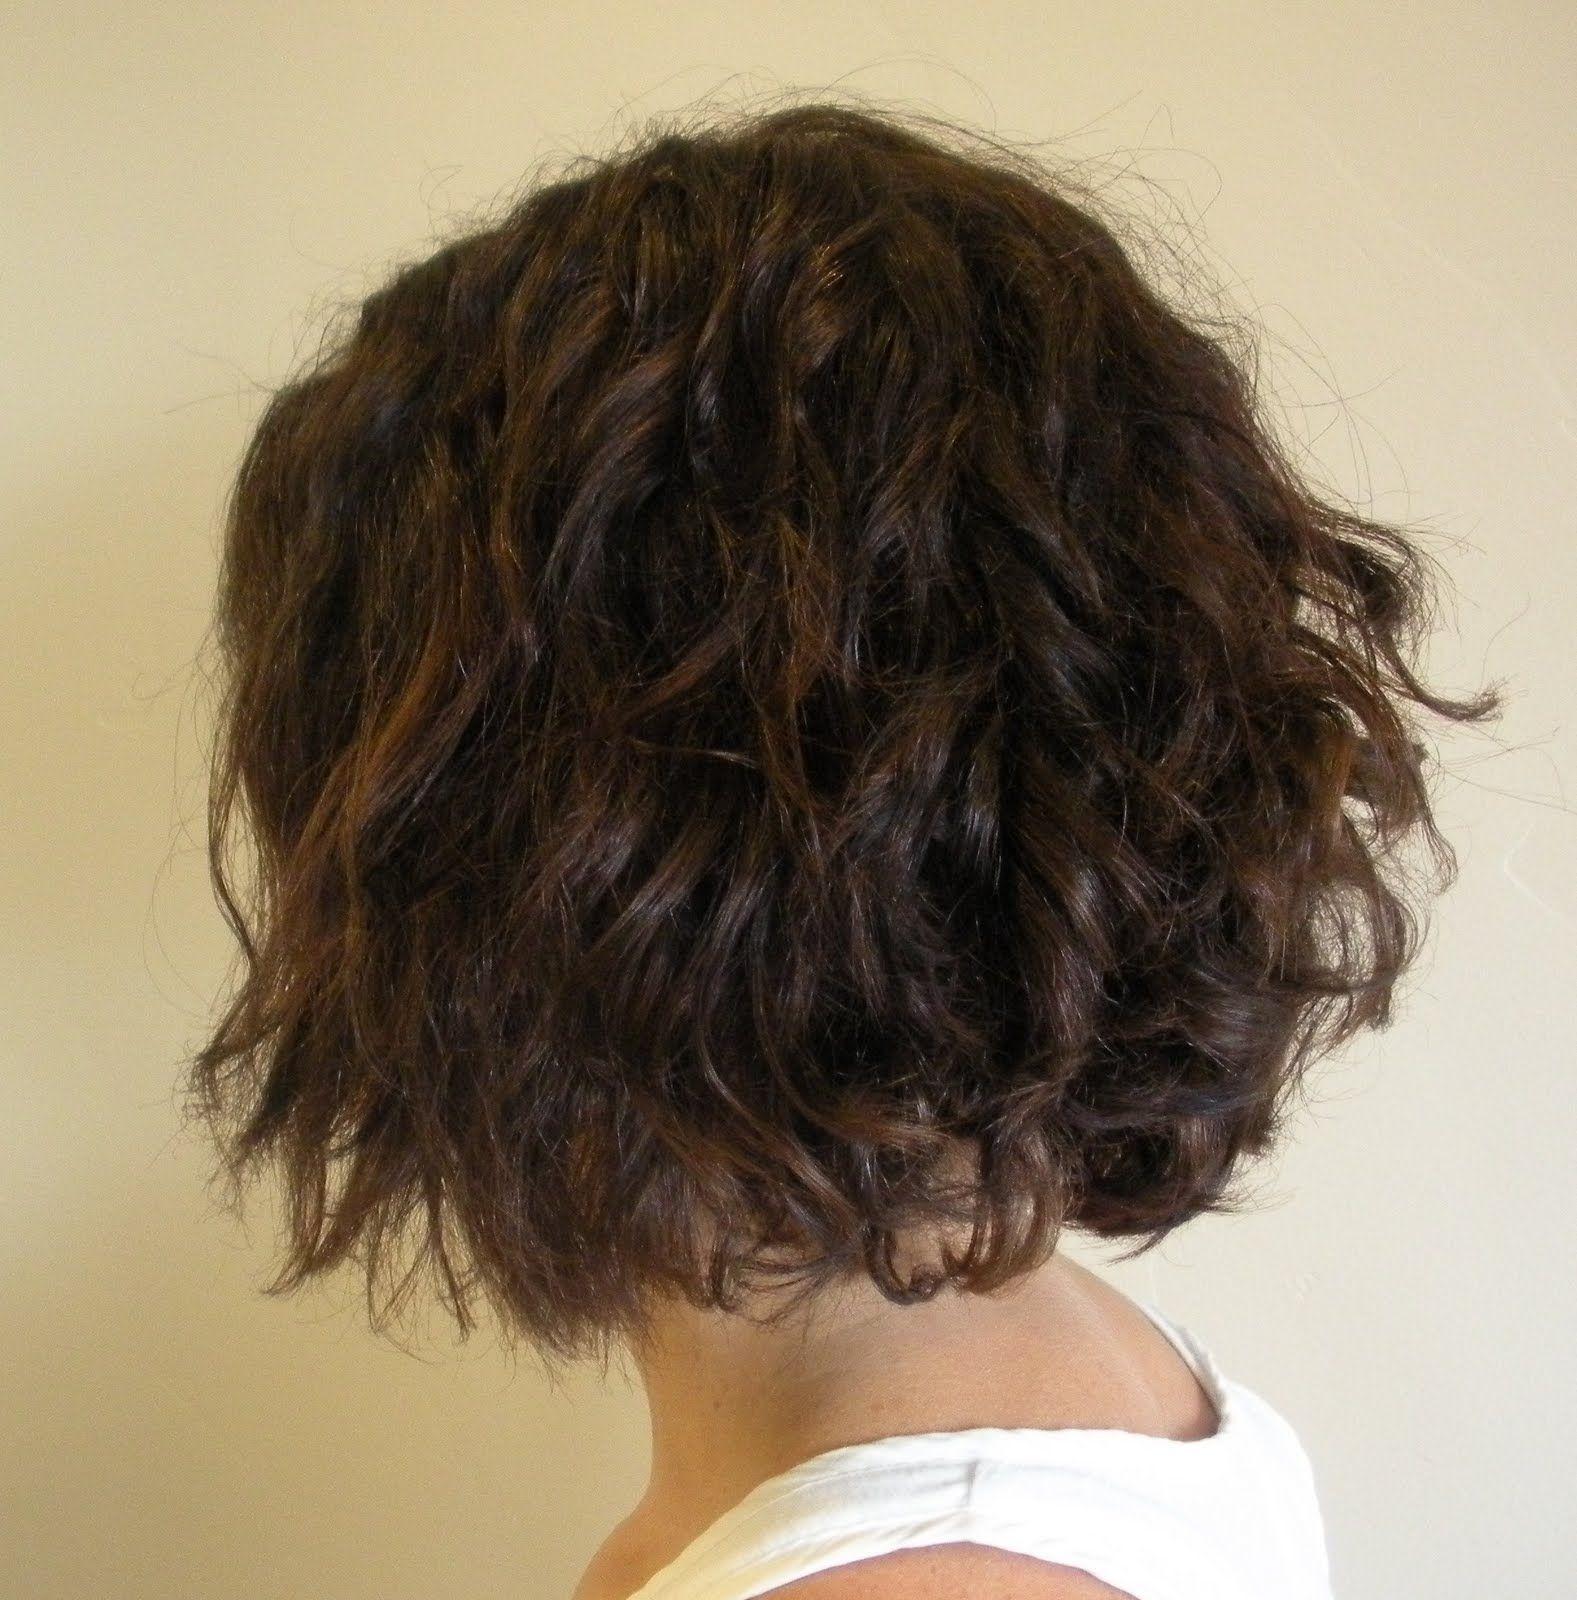 Beach Wave Perm Wave Perm Short Hair Loose Perm Short Hair Short Permed Hair